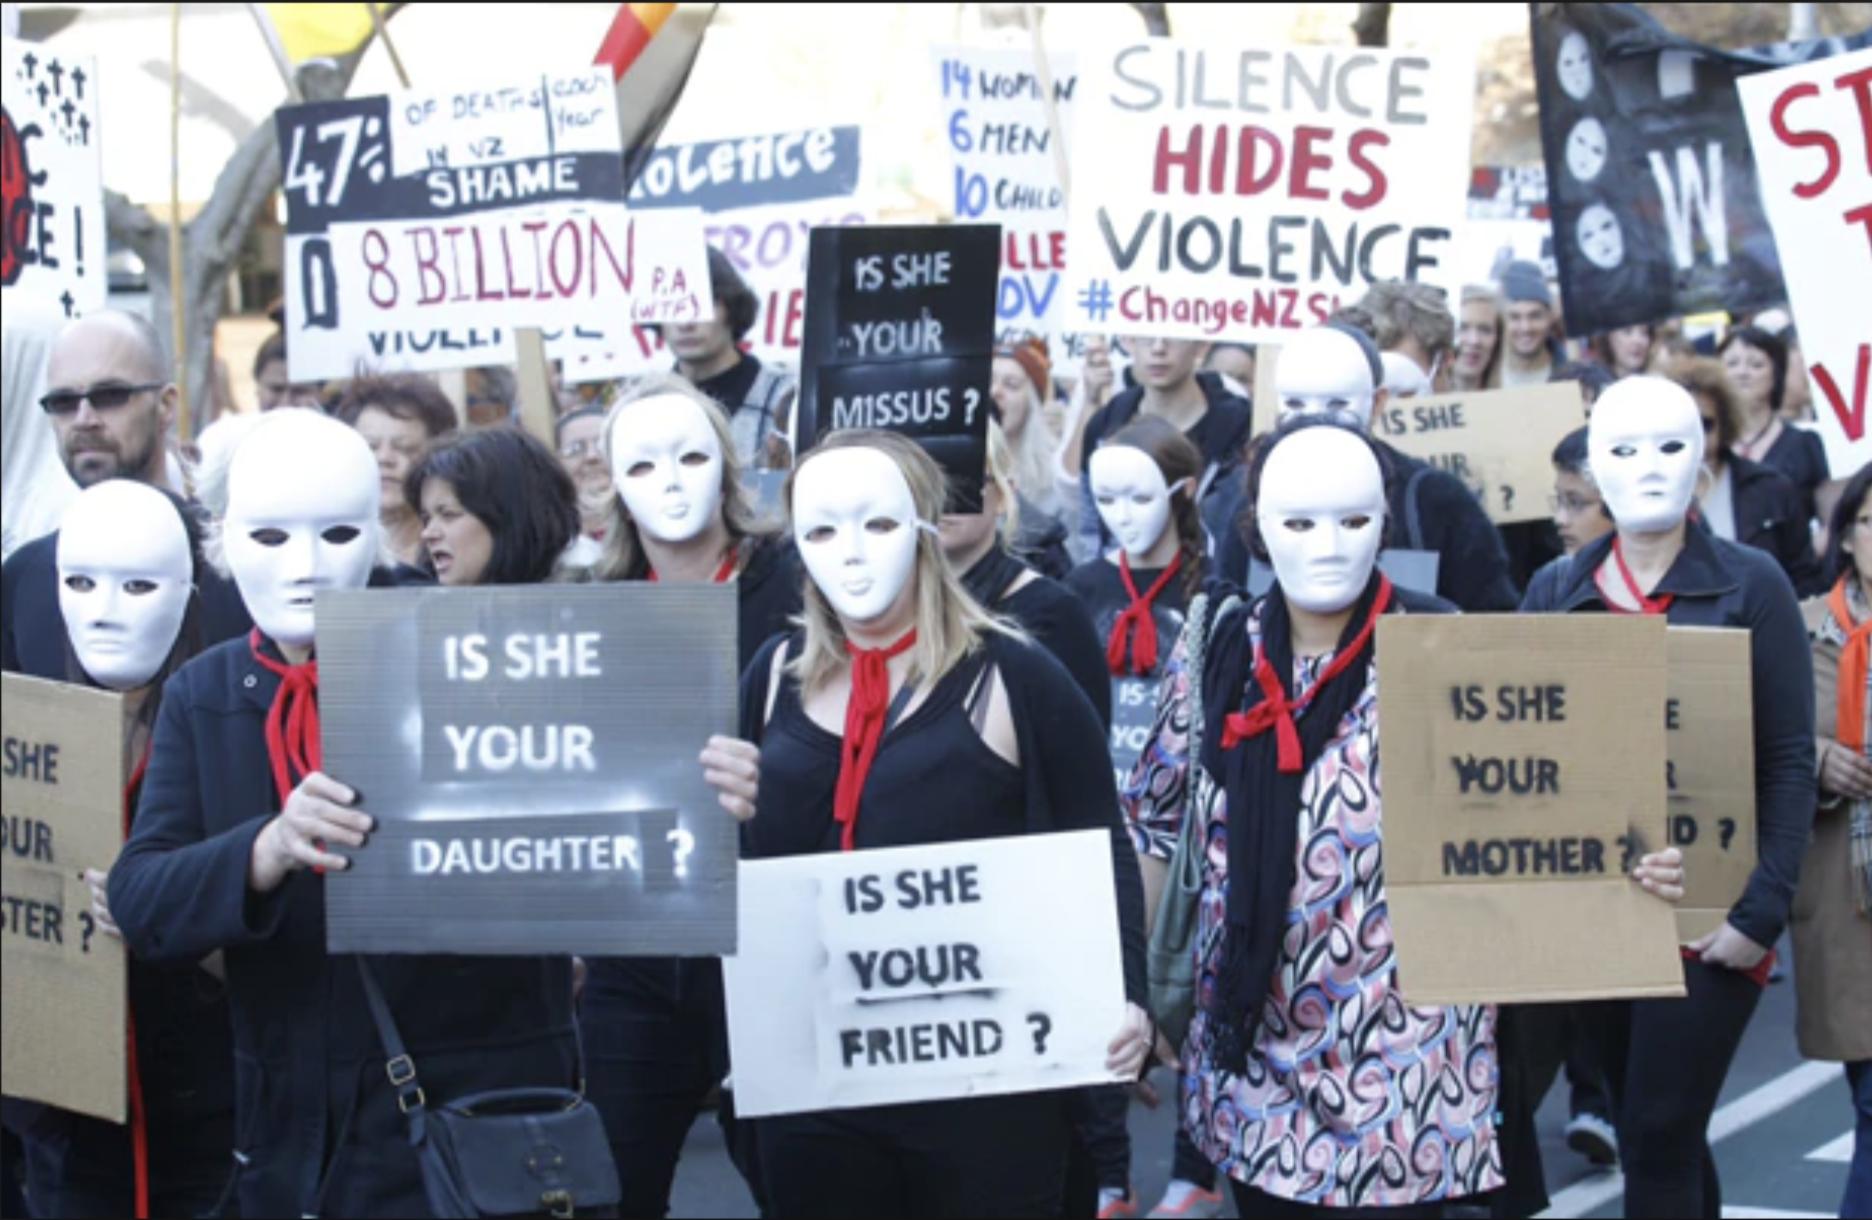 Demestic Violence Protest